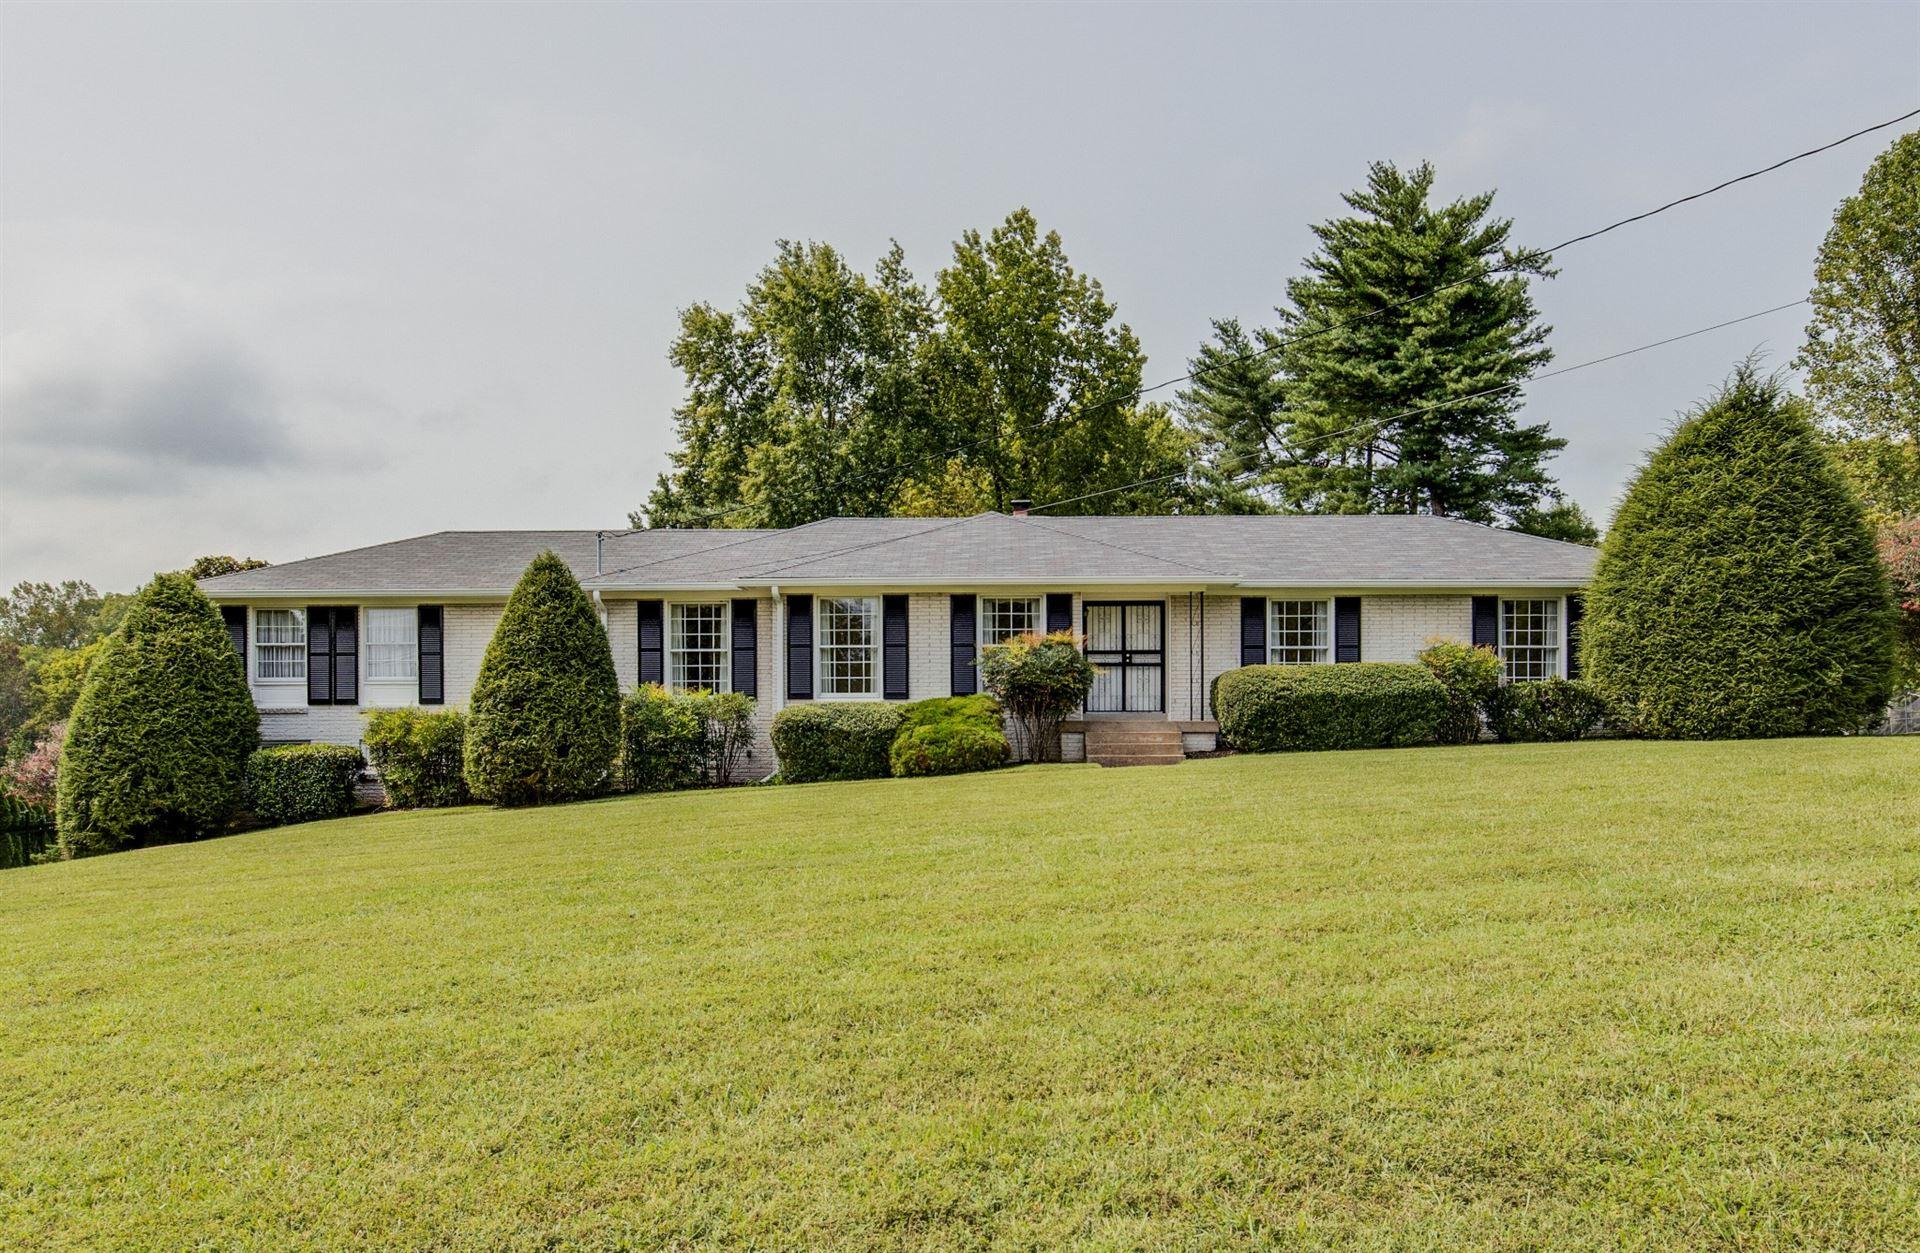 Photo of 5310 Stallworth Dr, Nashville, TN 37220 (MLS # 2189857)